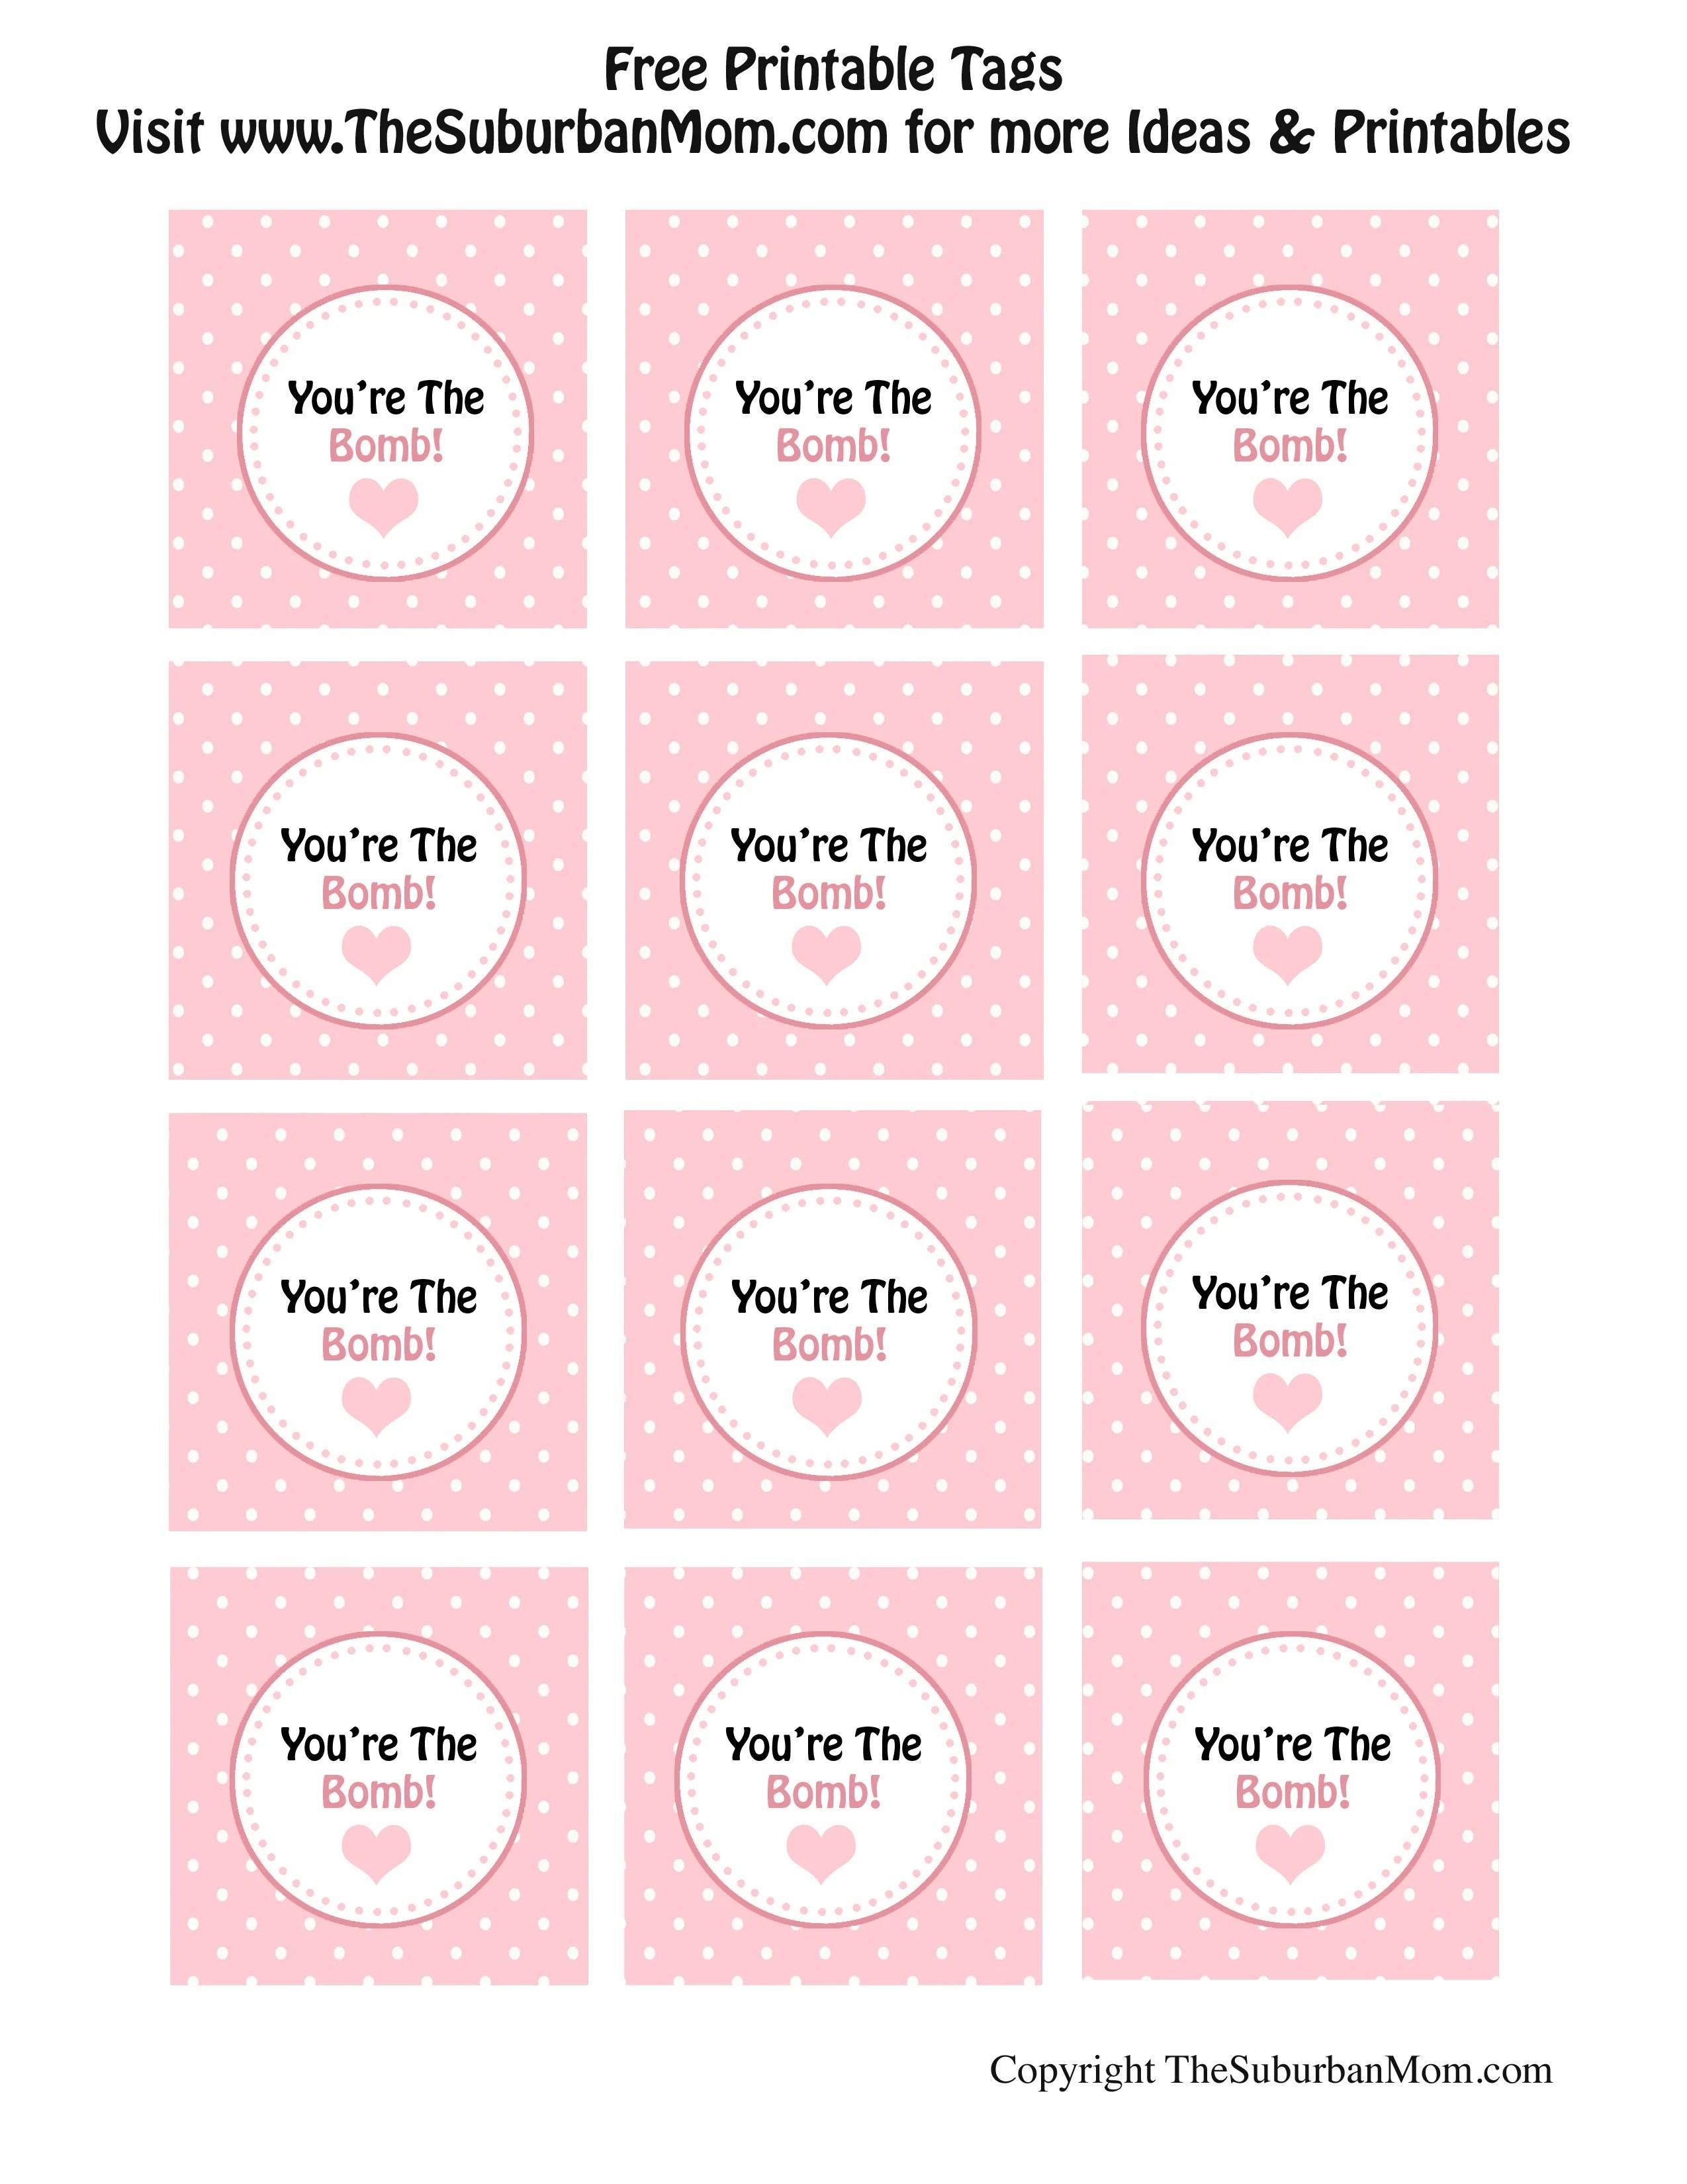 Diy Heart Baths Recipe With Free Tag Printables